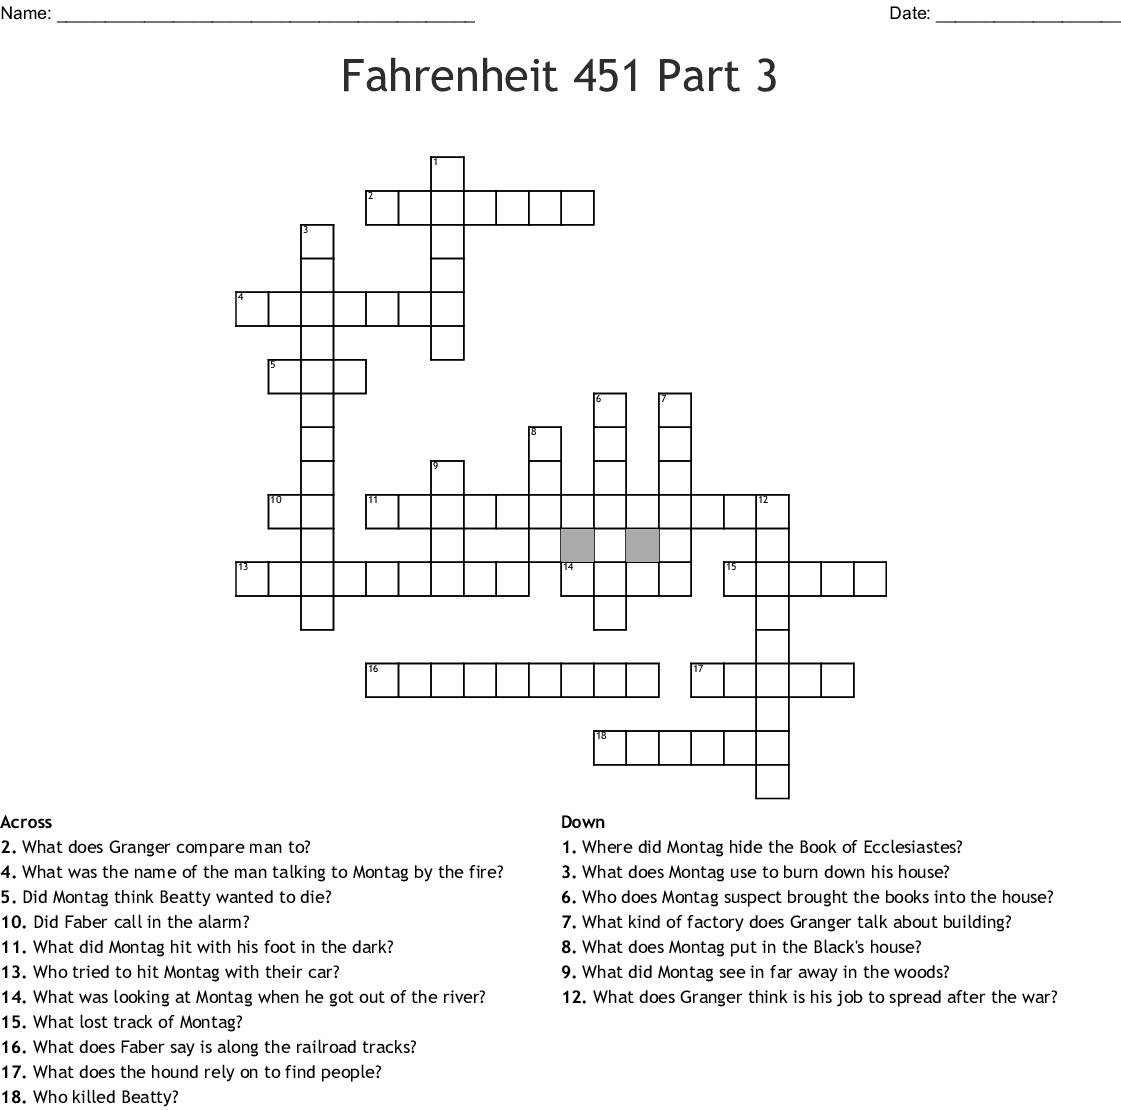 Fahrenheit 451 Crossword